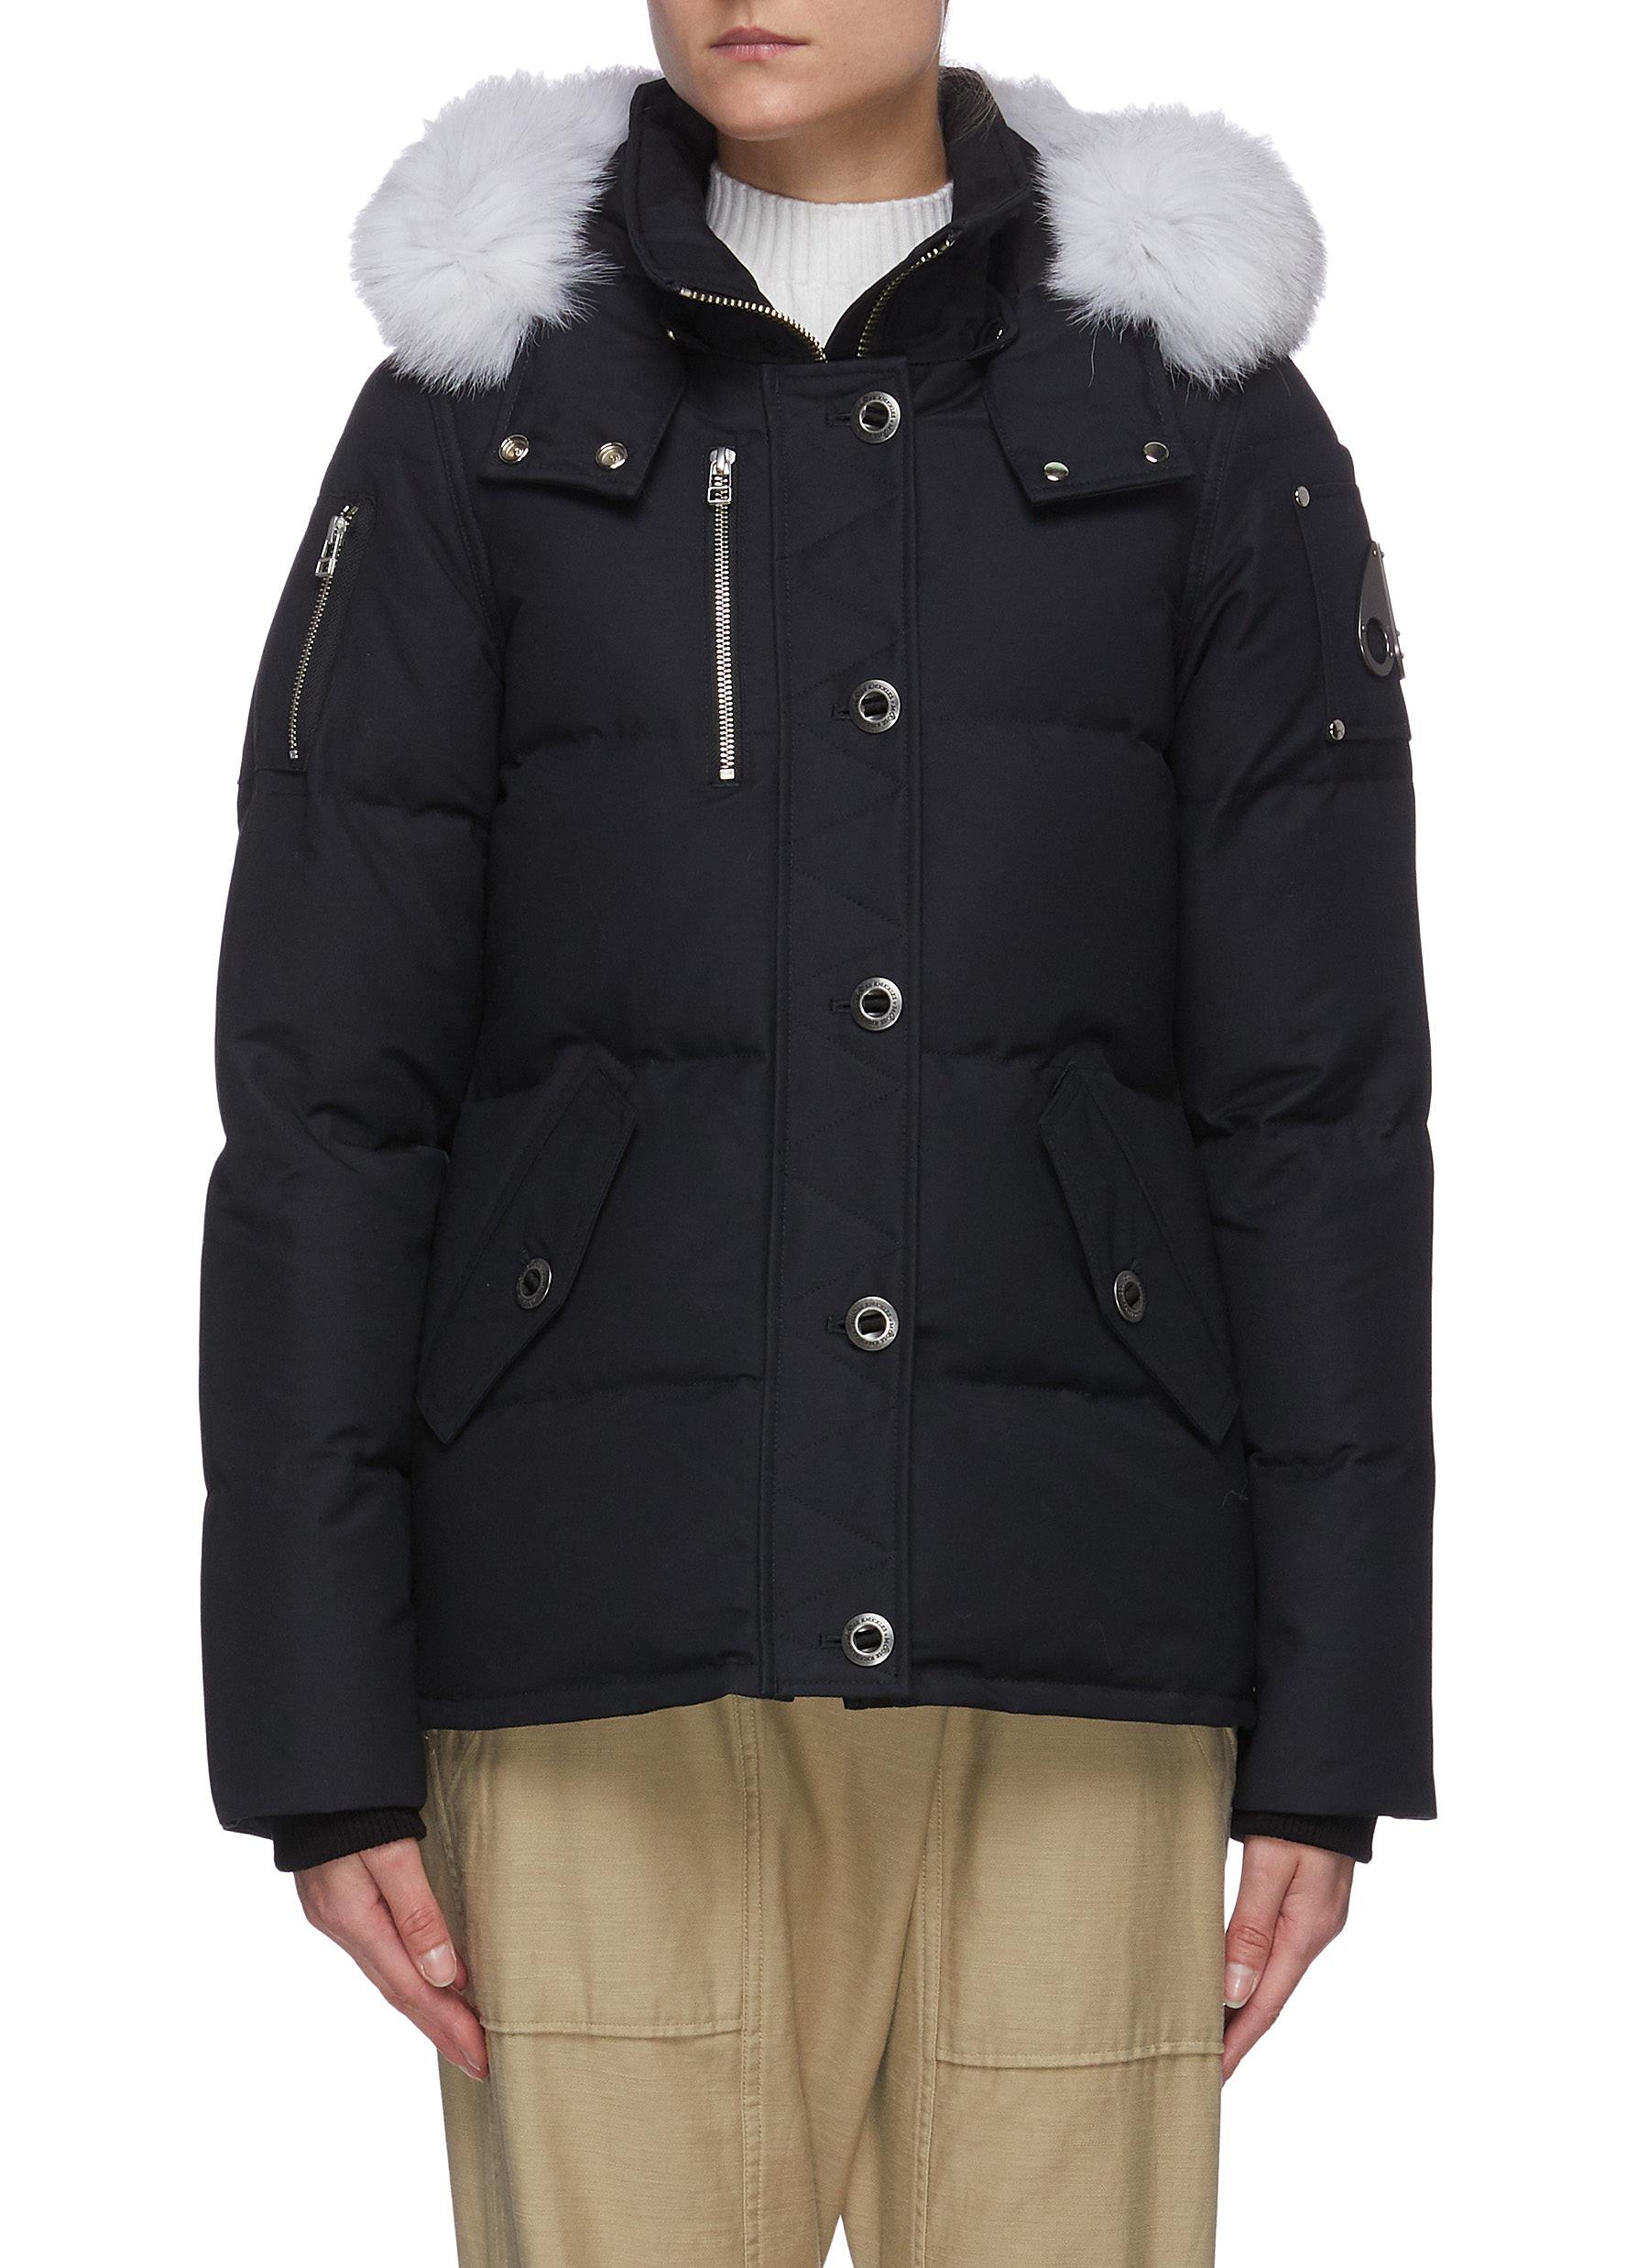 Q' Fox fur trim nylon duck down jacket - MOOSE KNUCKLES - Modalova